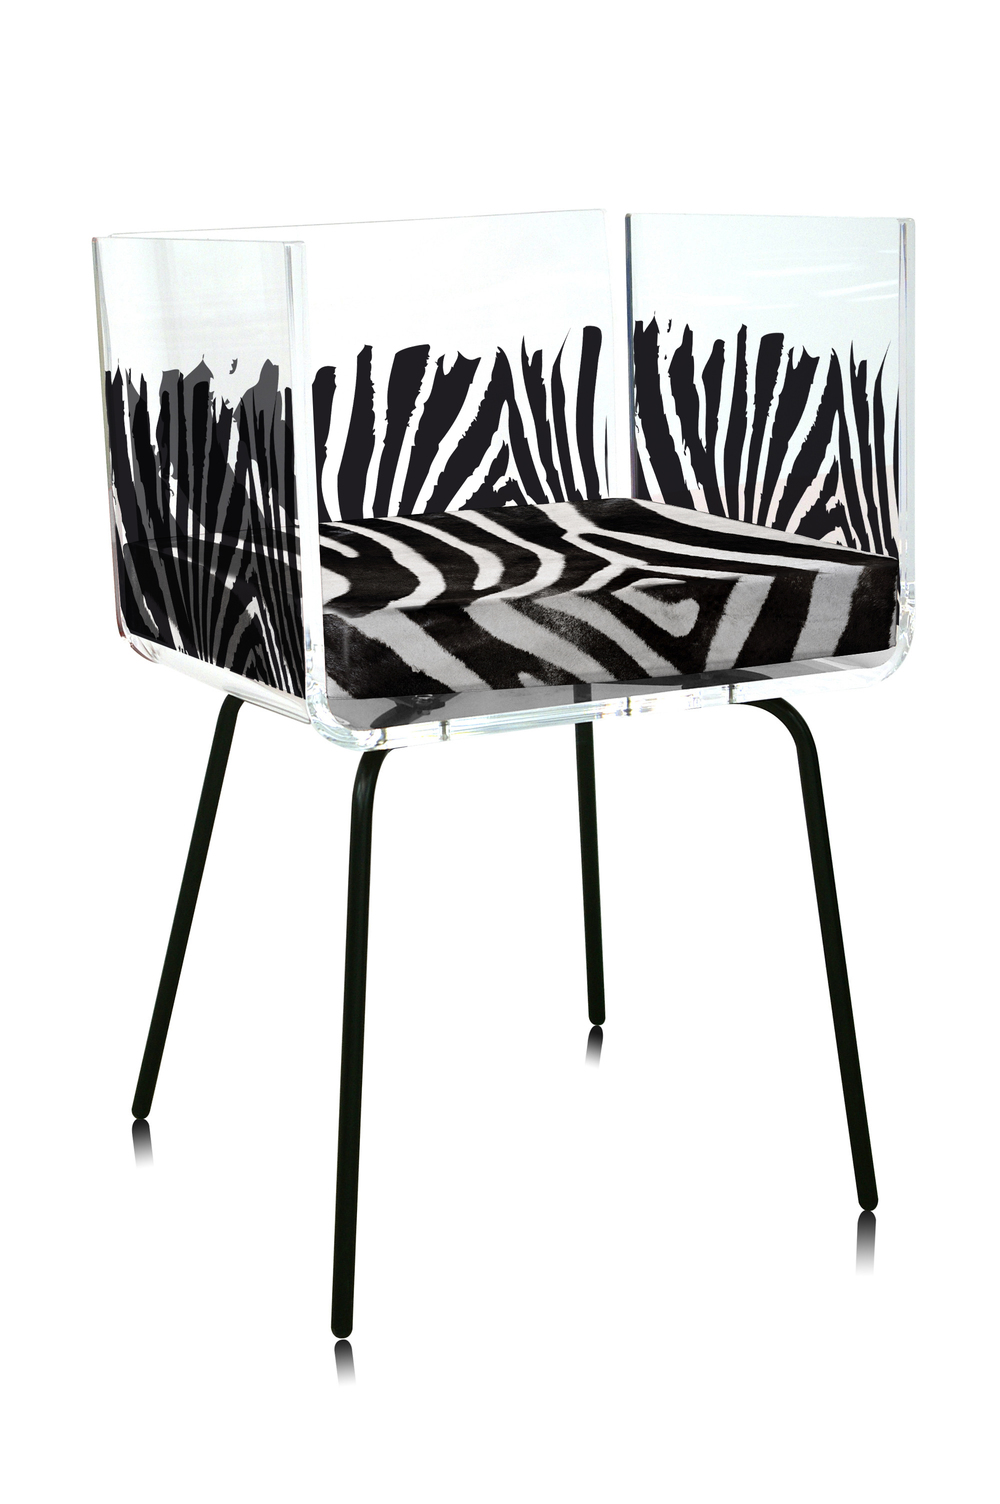 Fauteuil Cali zebre.jpg